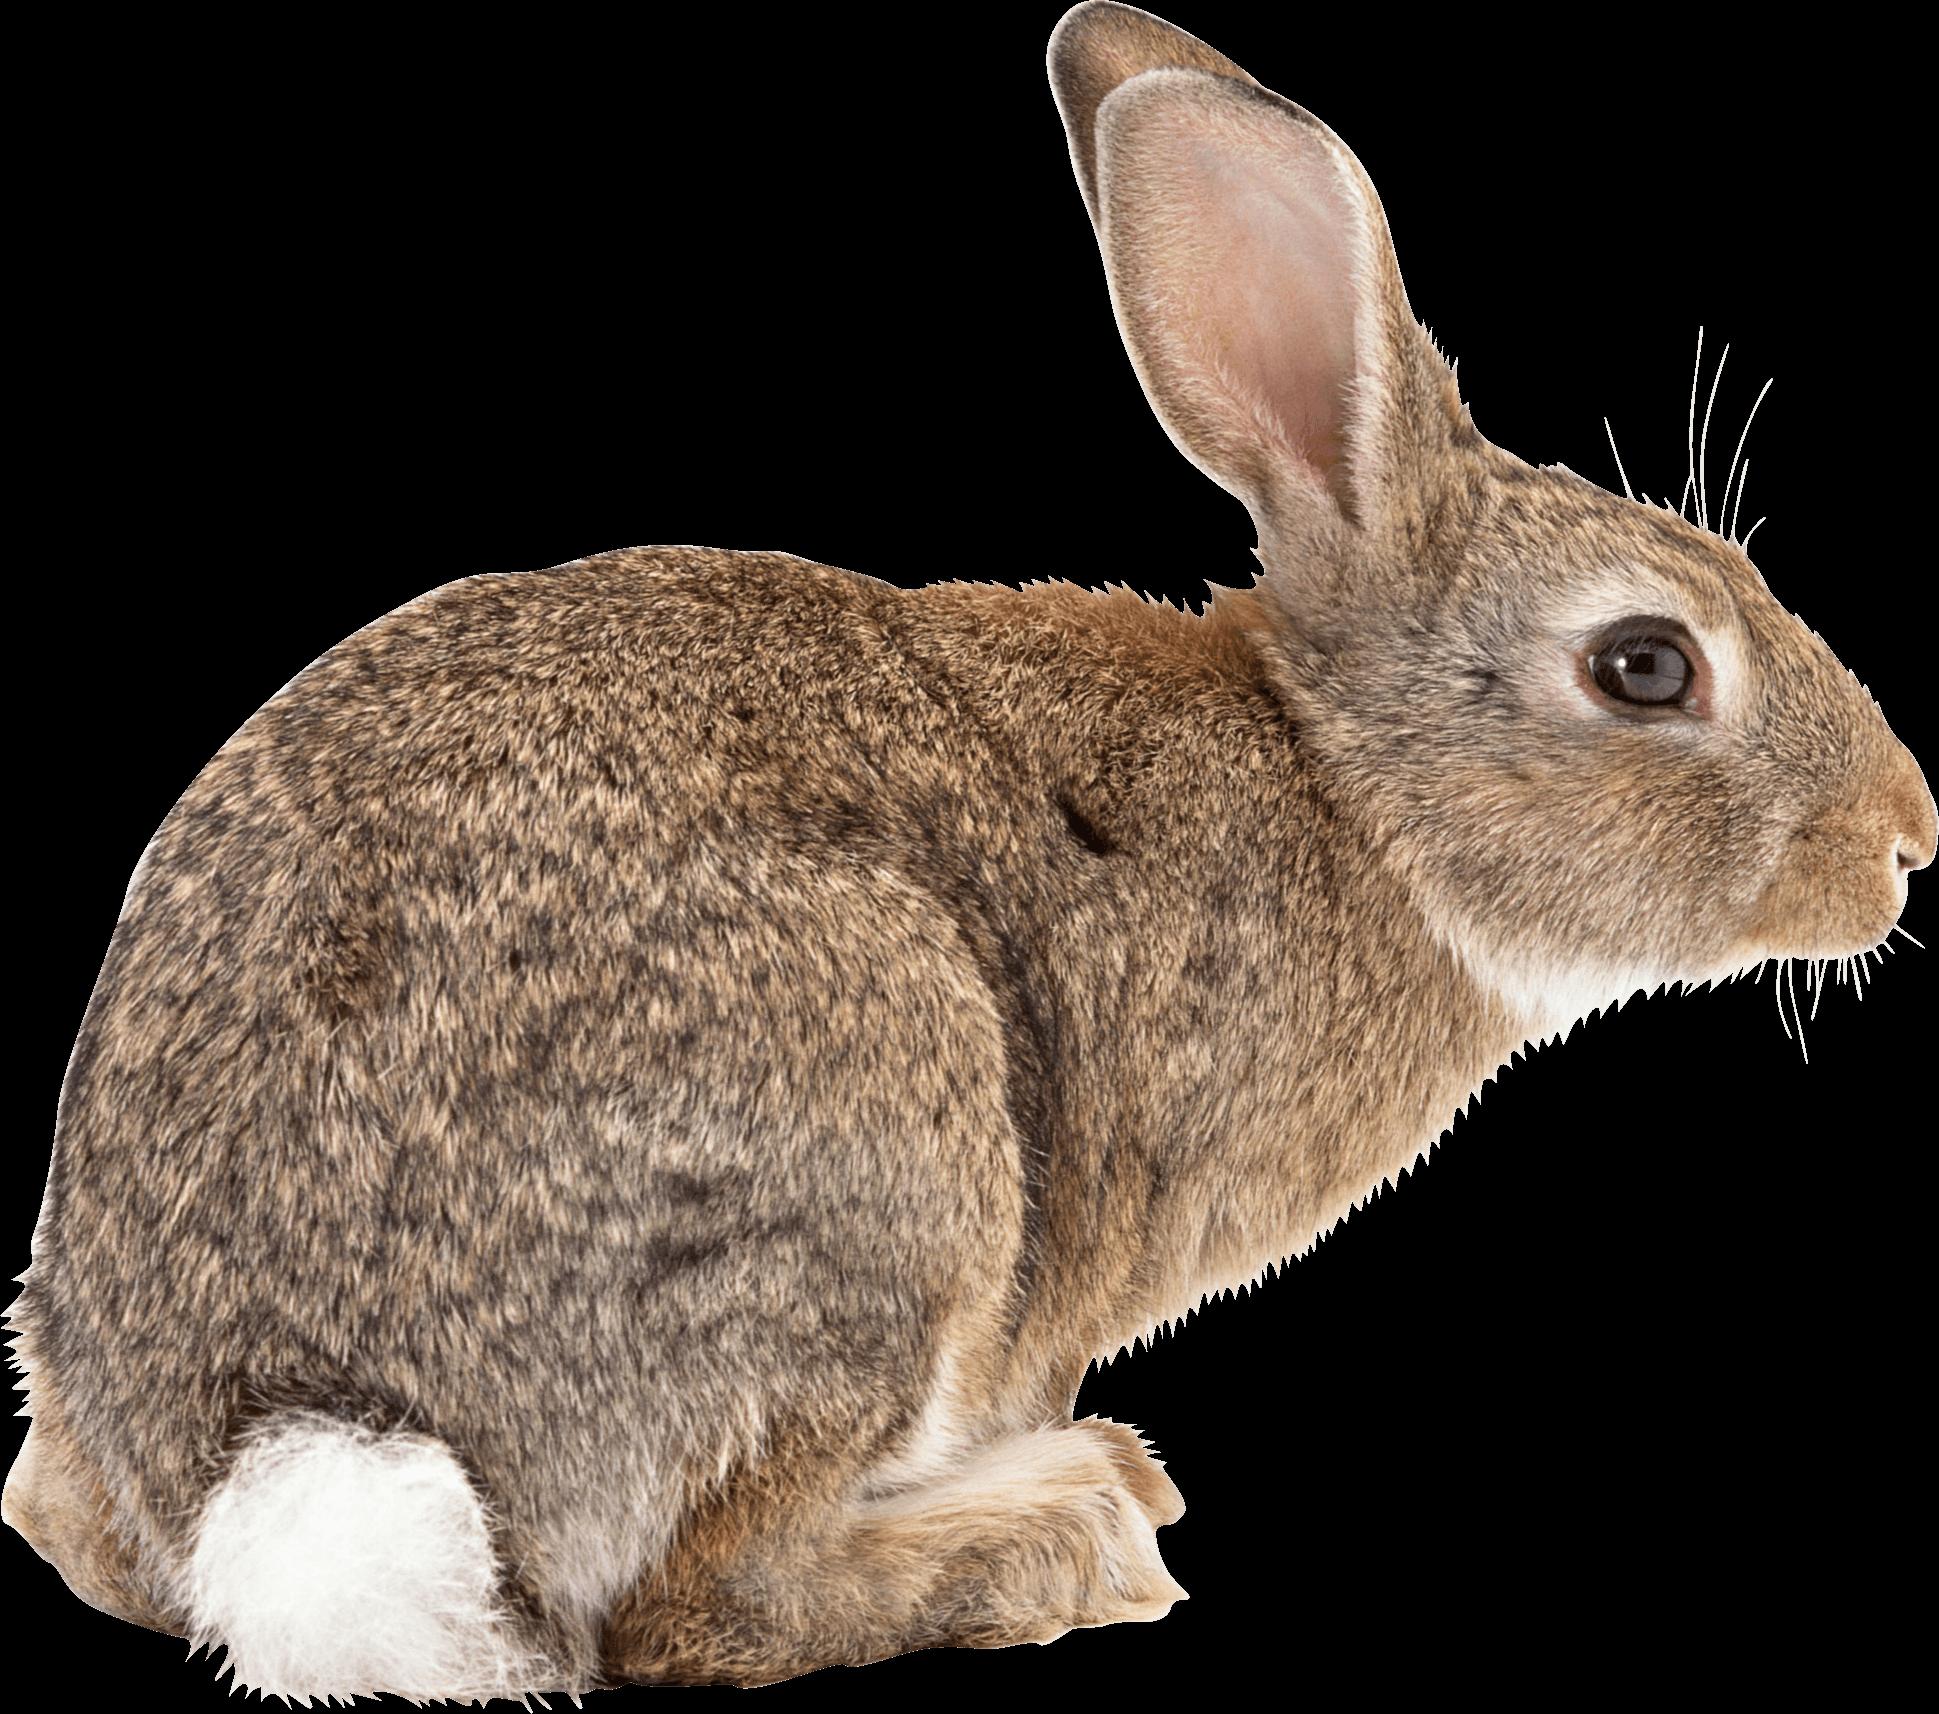 Rabbit Png image #40318 - Rabbit PNG